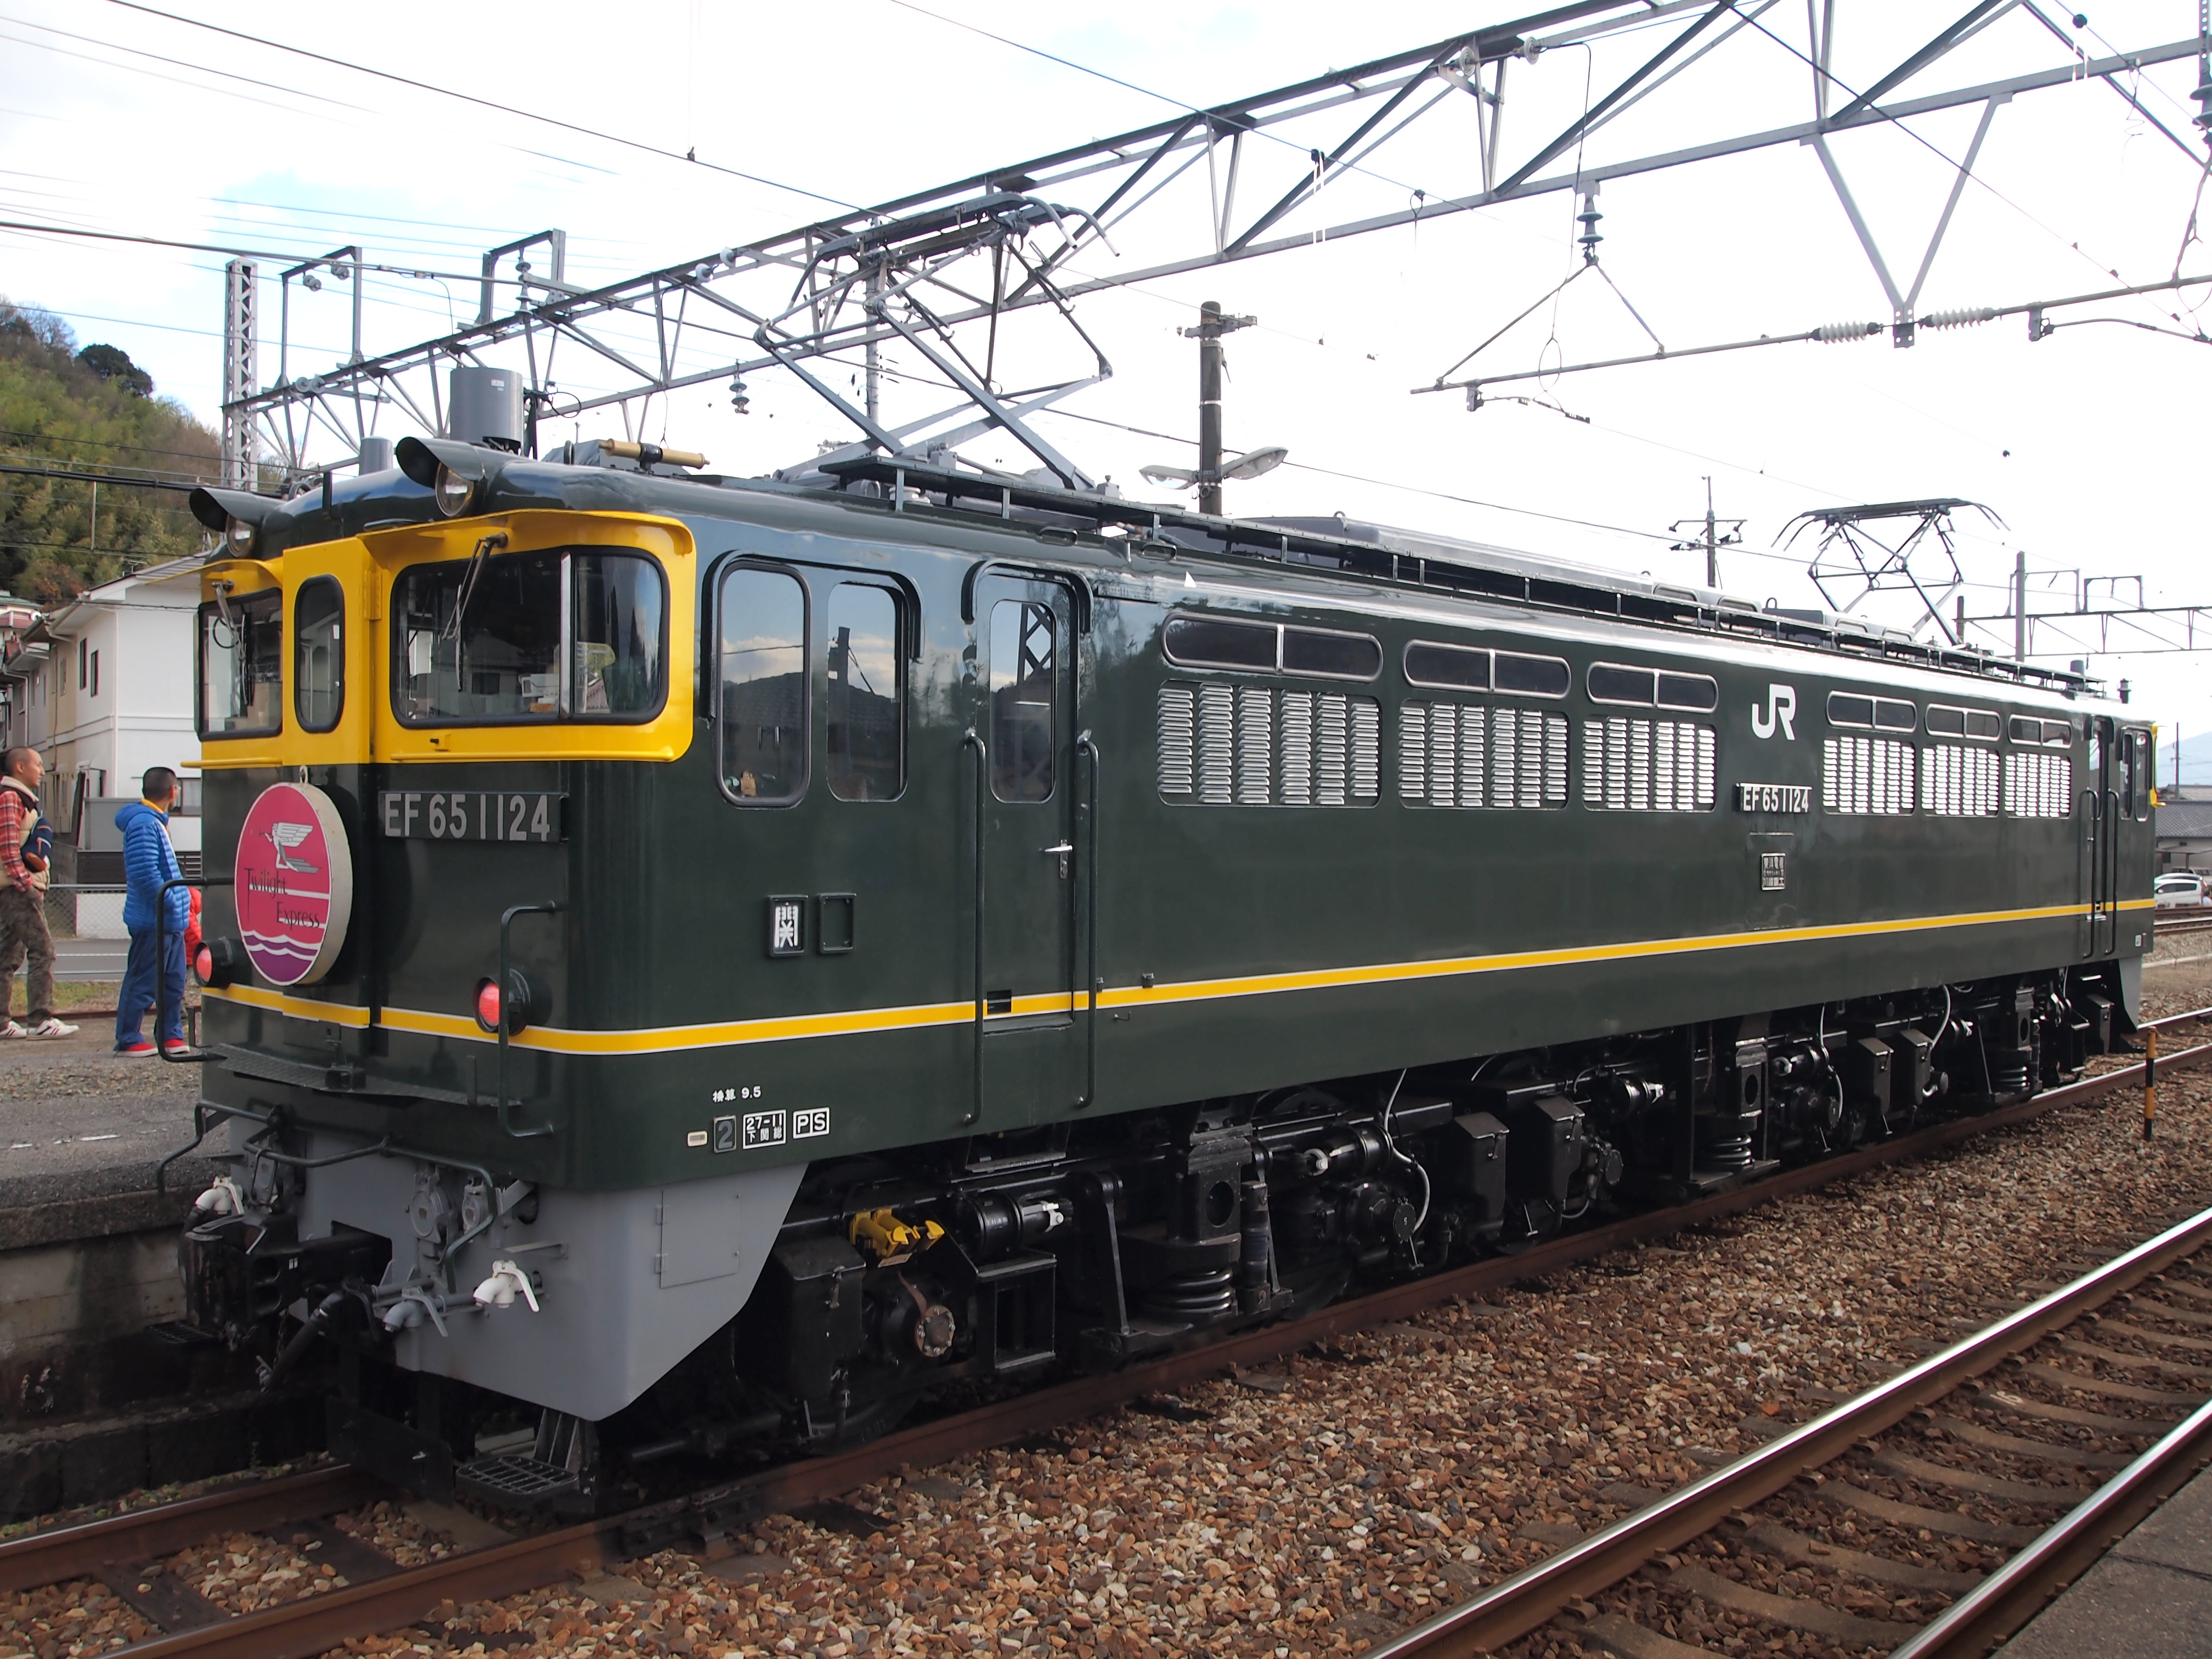 File:EF65 1124 Twilight Express 20151219.jpg